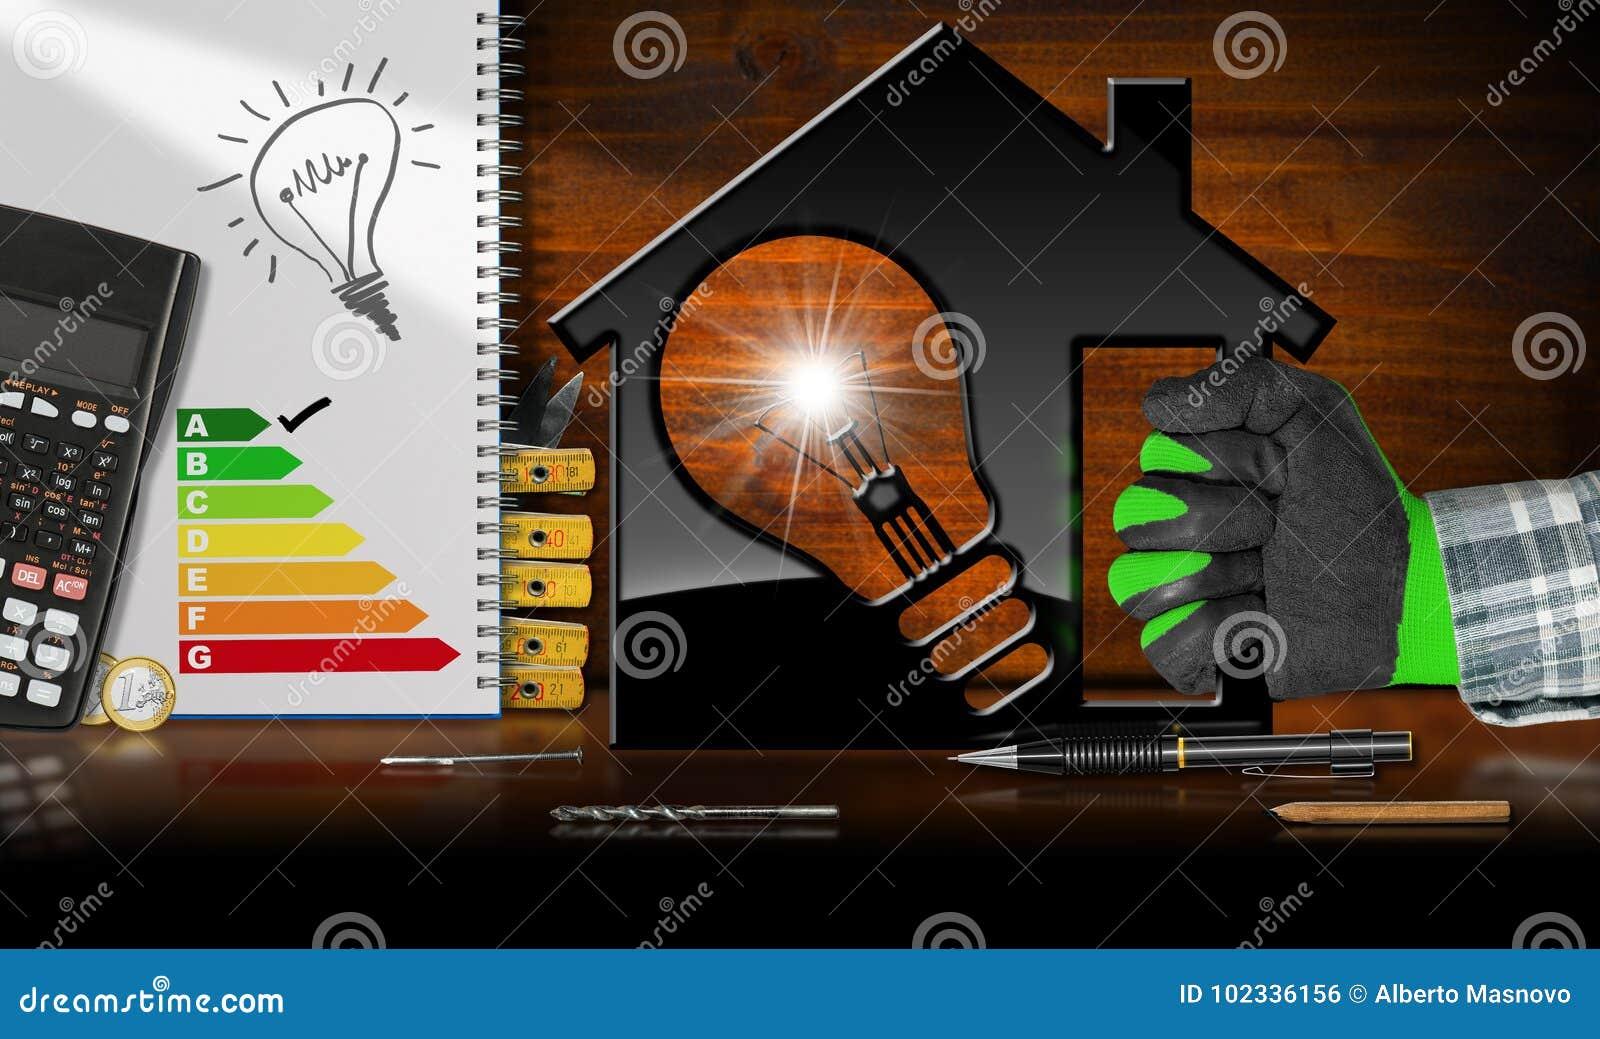 Model House and Light Bulb - Energy Efficiency